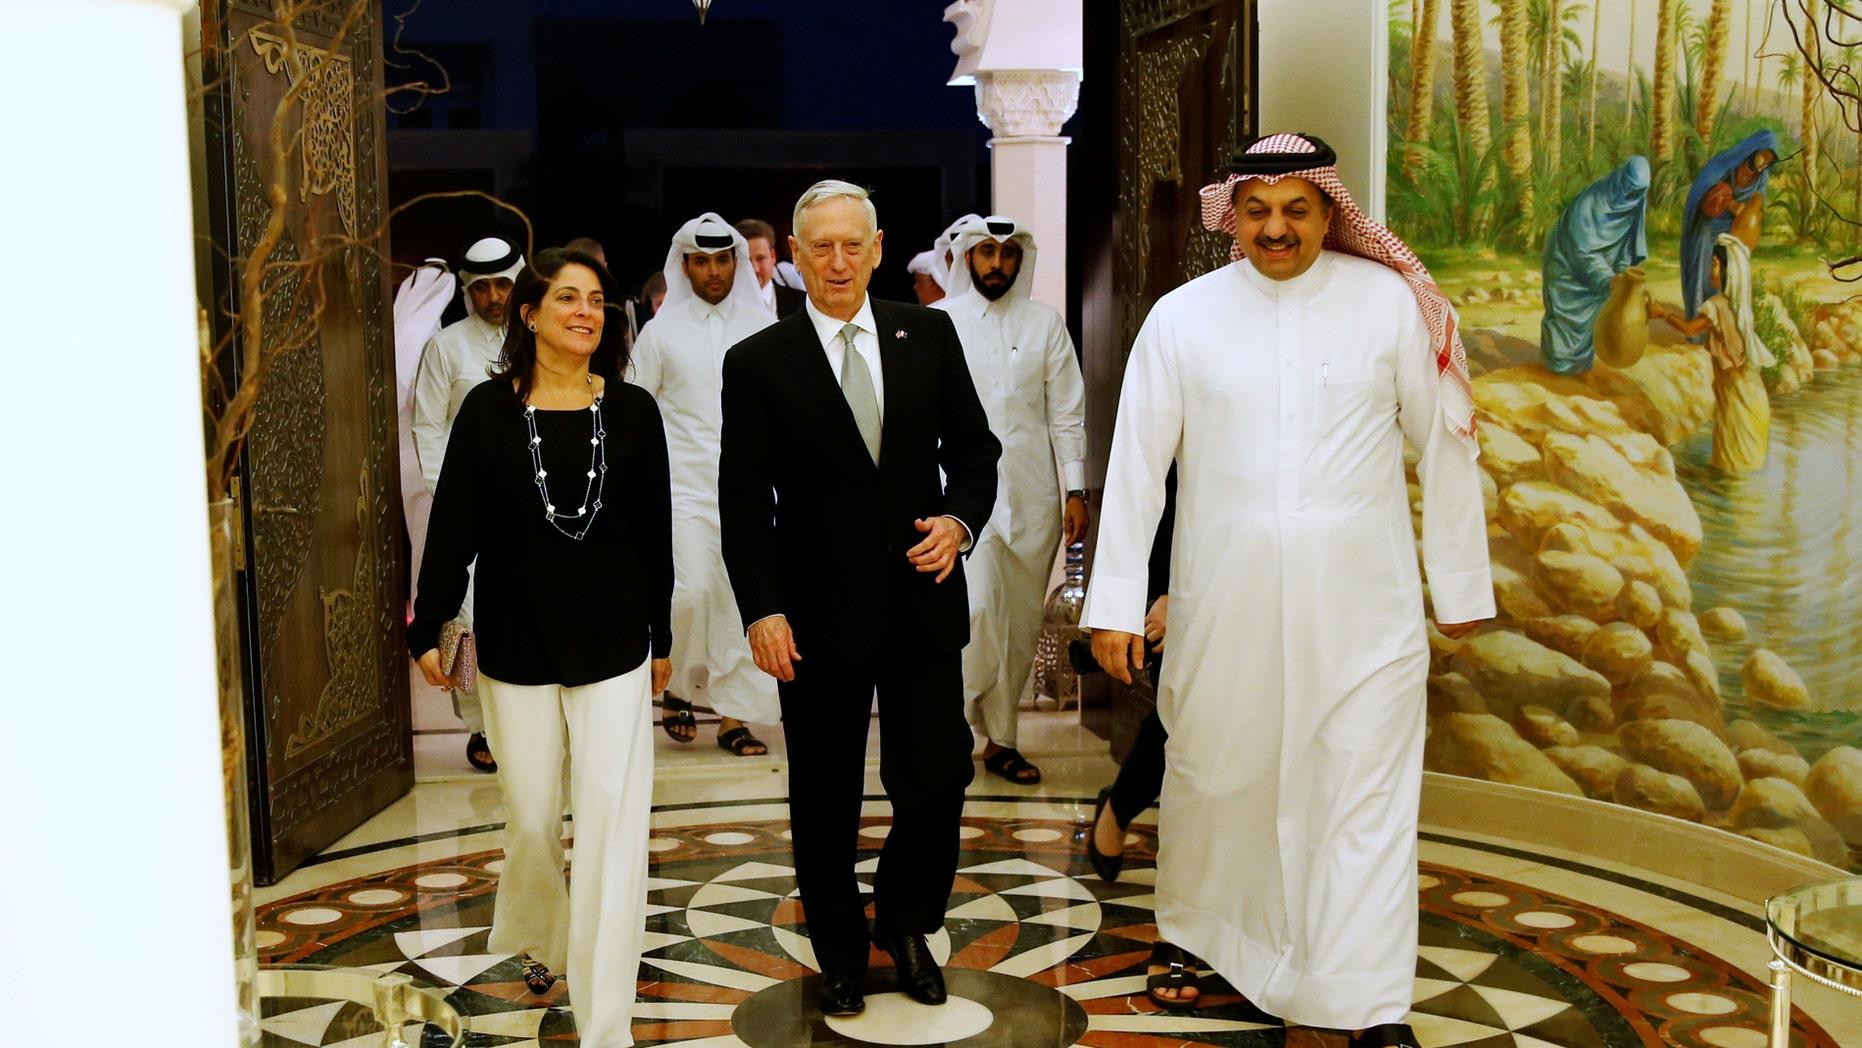 Qatar's Minister of Defence Khalid bin Mohammad Al-Attiyah (R) welcomes U.S. Defence Secretary James Mattis (C) and U.S. Ambassador to Qatar Dana Shell Smith (L) at his residence in Doha, Qatar April 22, 2017. REUTERS/Jonathan Ernst - RTS13GRB